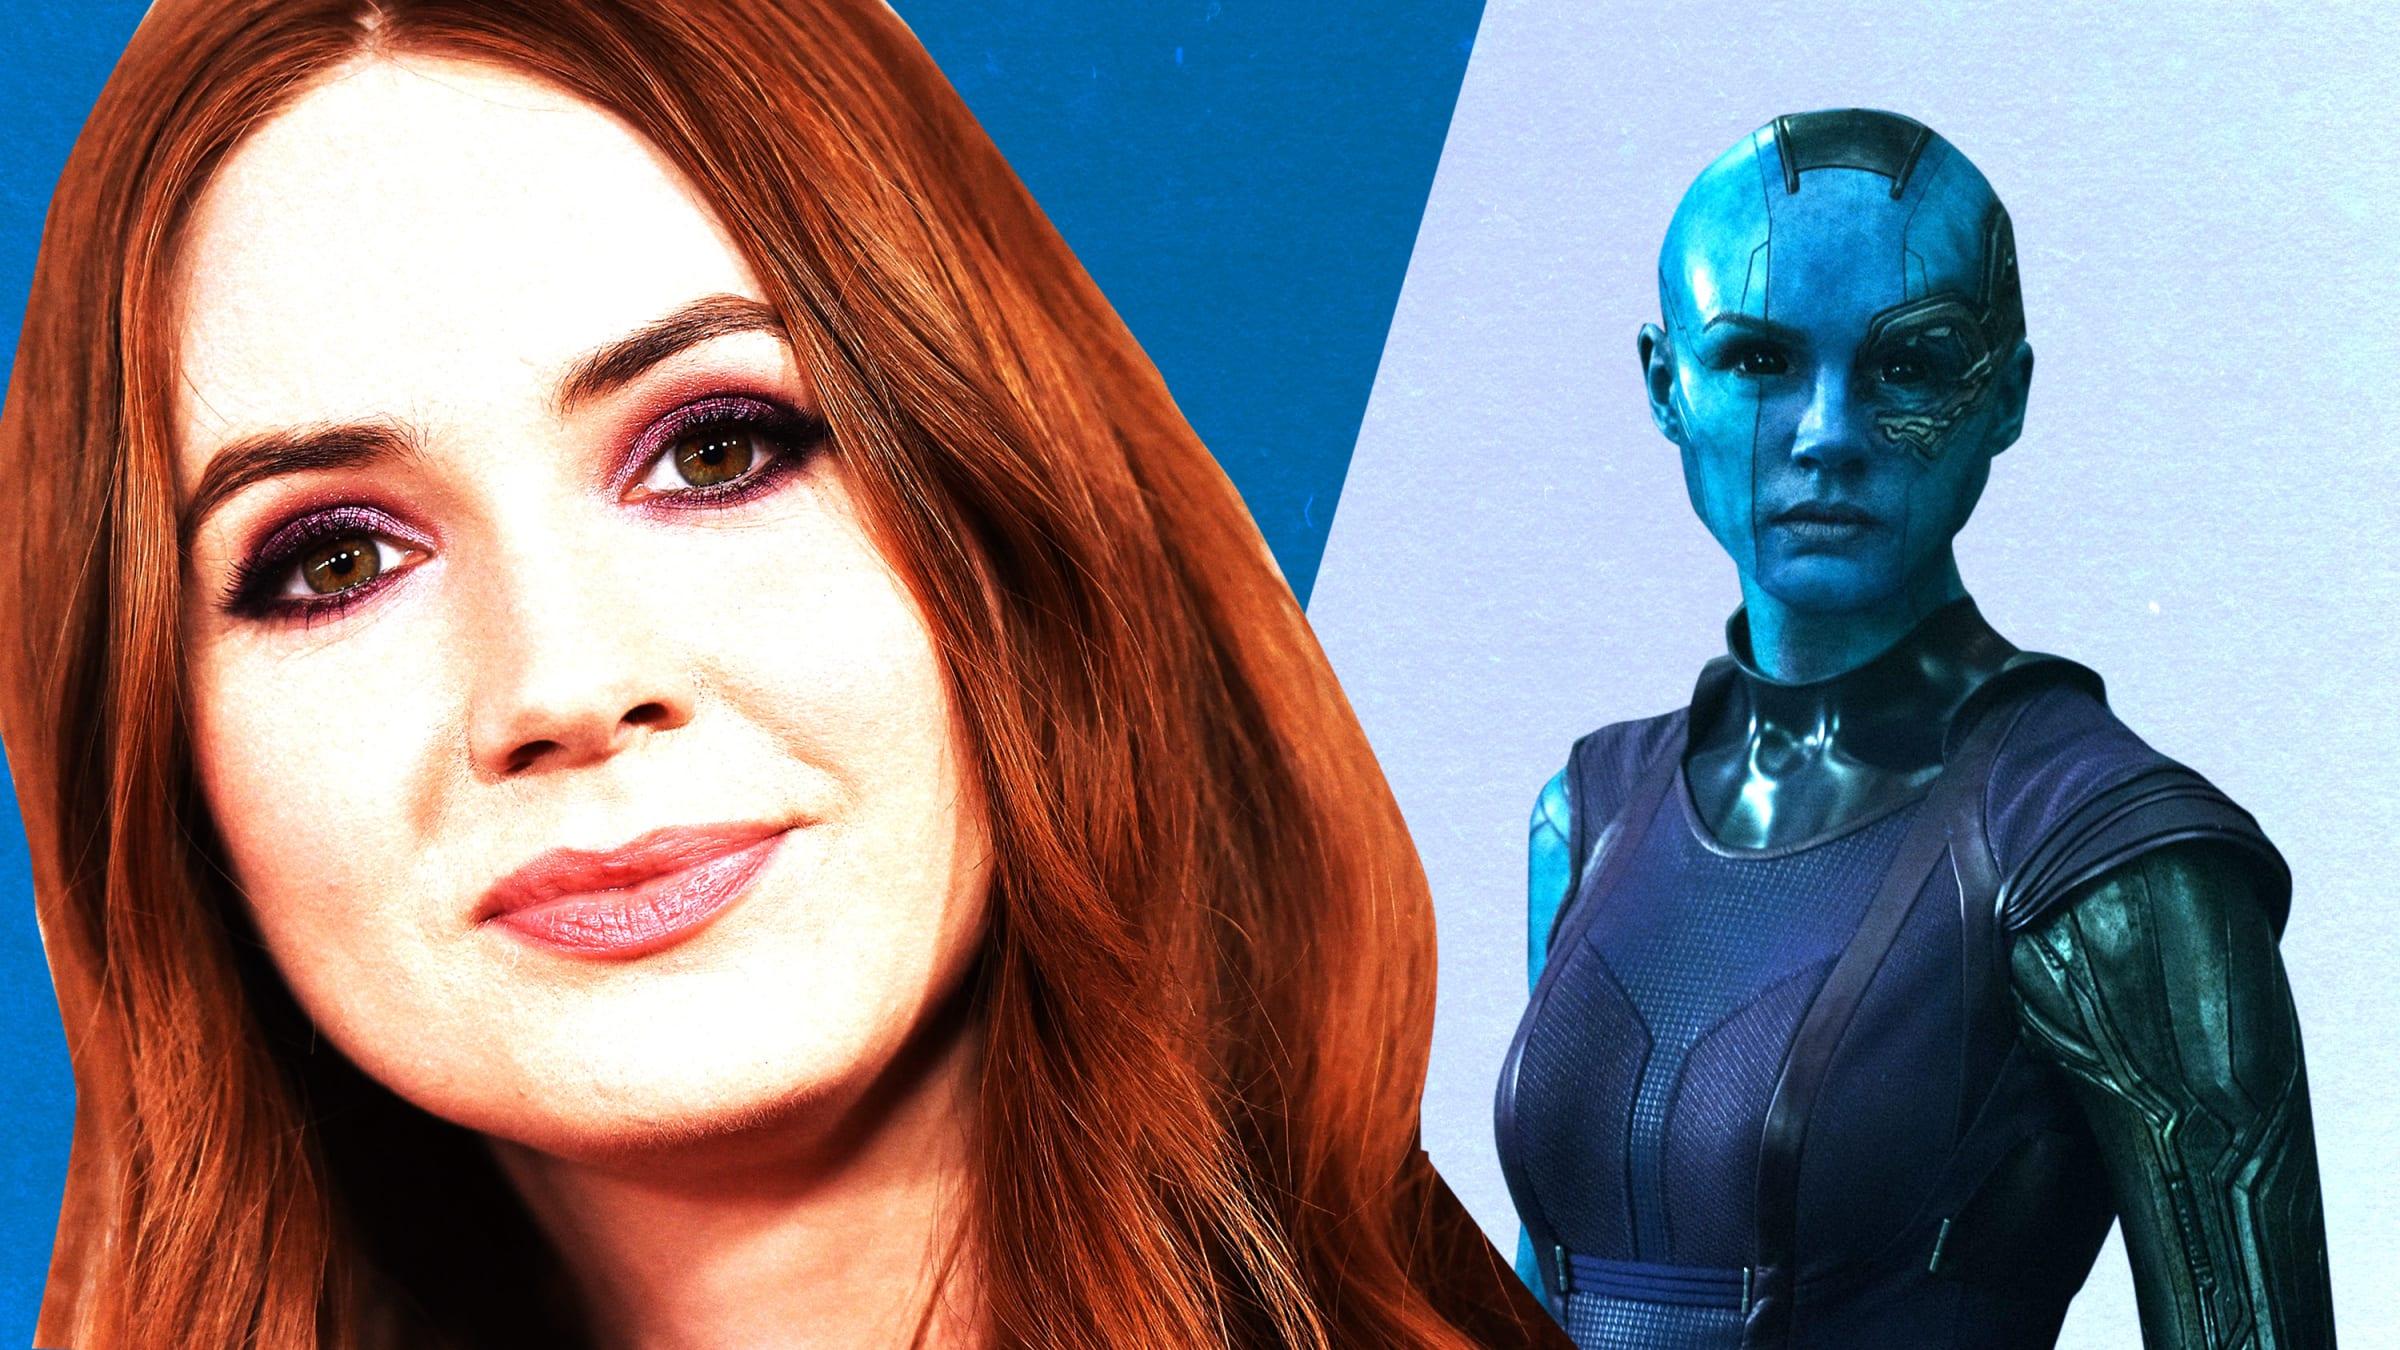 Karen Gillan on the Future of Nebula Post-'Avengers: Endgame' and James Gunn's Return to 'Guardians'